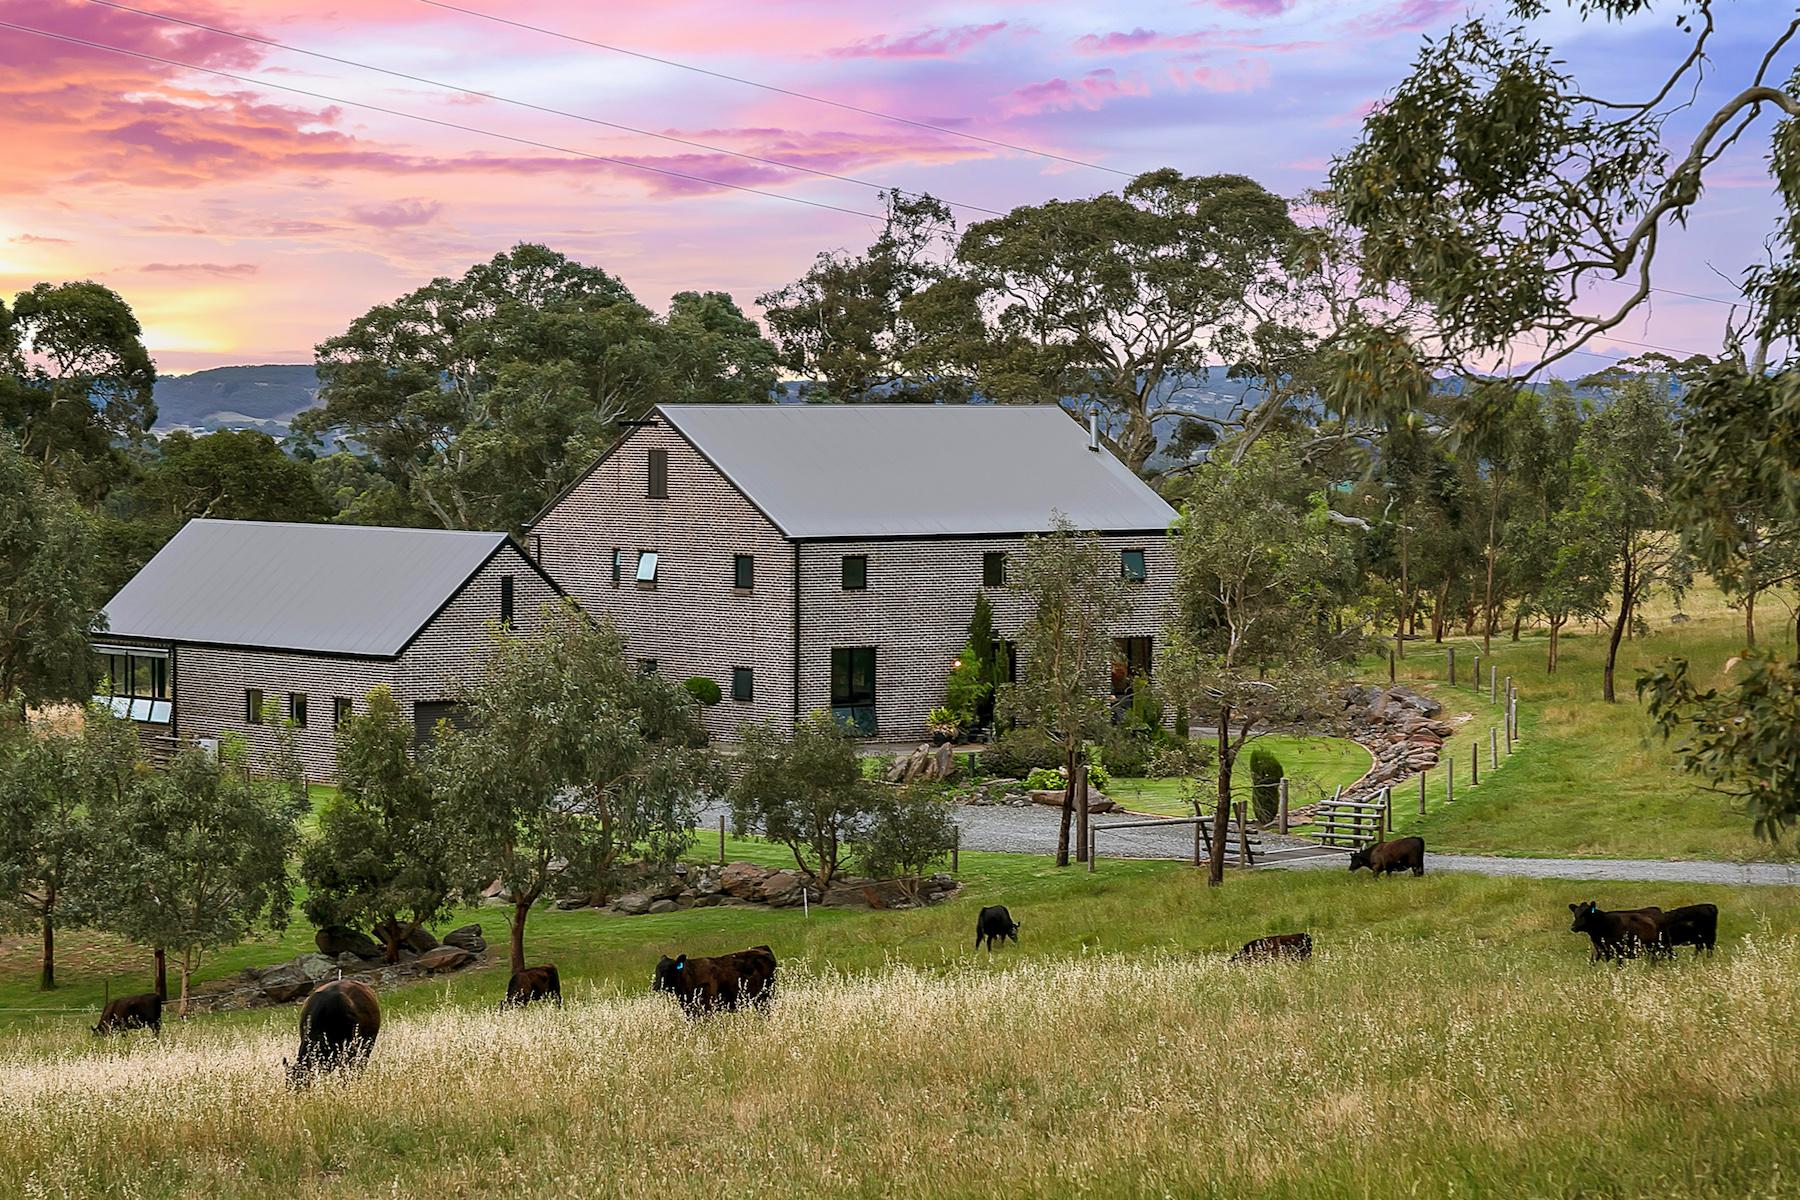 Частный односемейный дом для того Продажа на Elegant Country Estate in Picturesque Setting 47 Woolshed Road, Mount Torrens, South Australia, 5244 Австралия